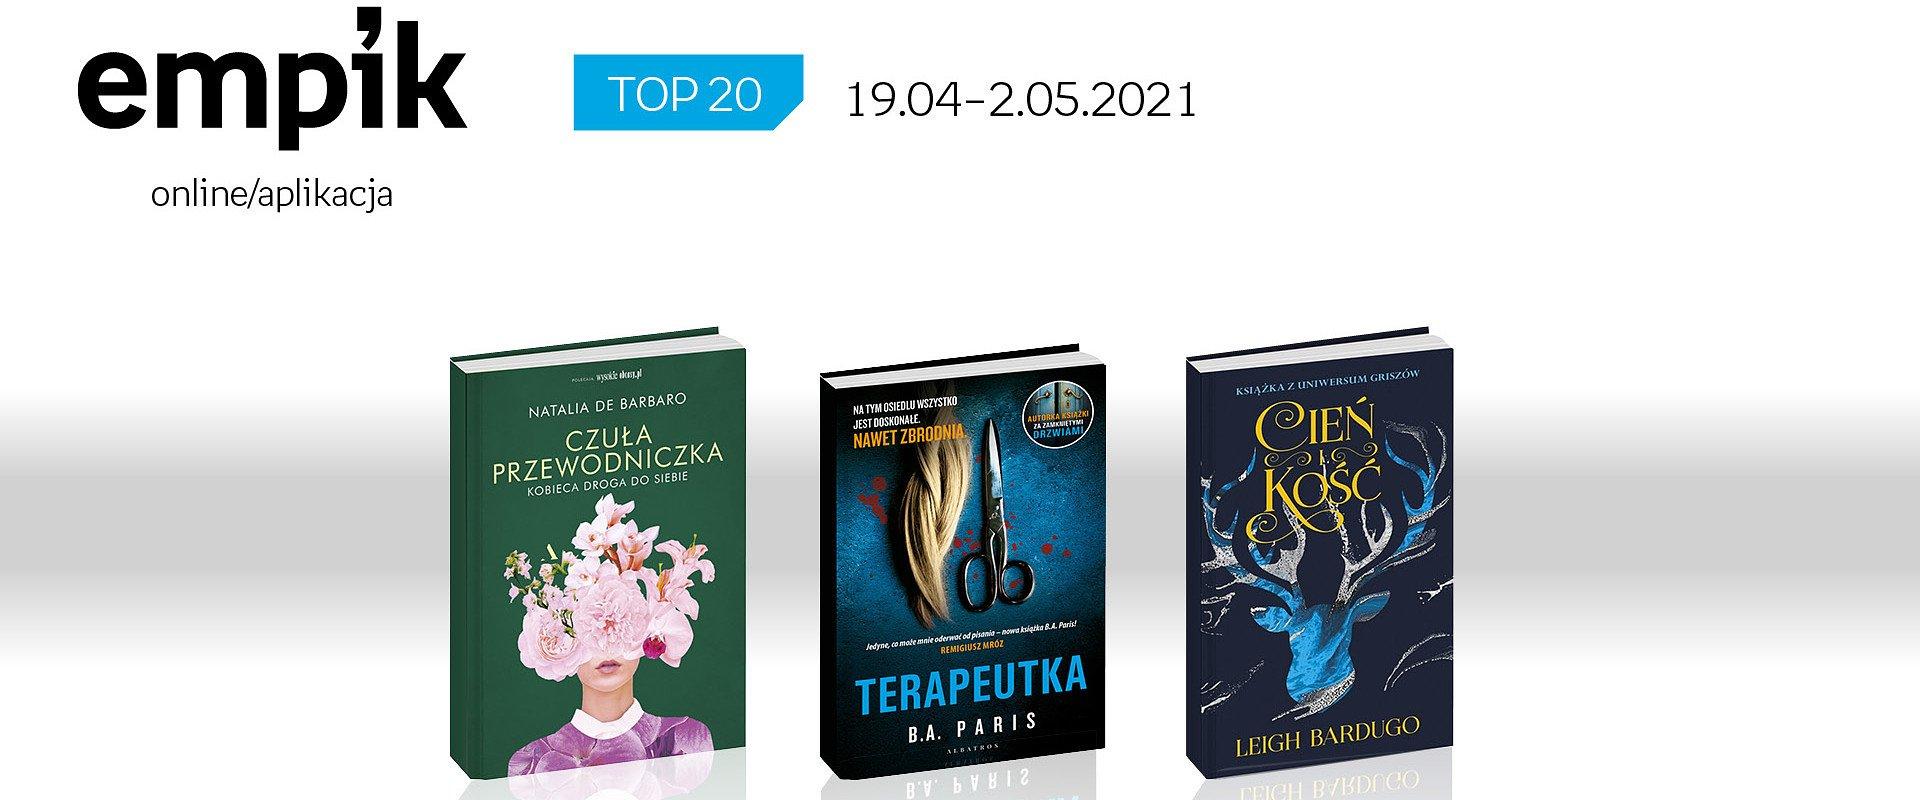 Książkowa lista TOP 20 na Empik.com za okres 19 kwietnia – 2 maja